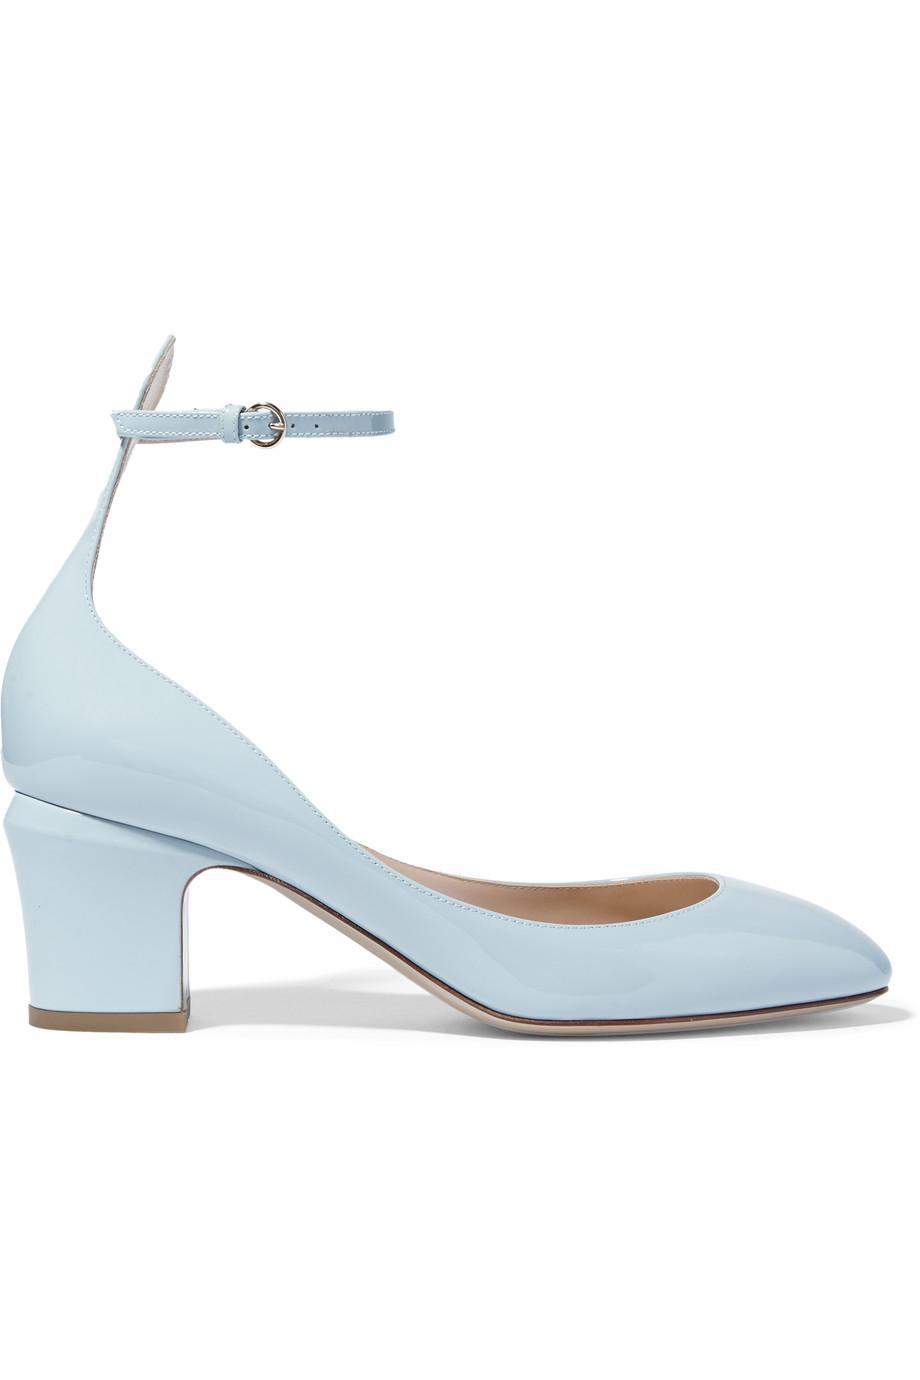 Valentino Tan-Go Patent-Leather Pumps, Light Blue, Women's US Size: 5, Size: 35.5